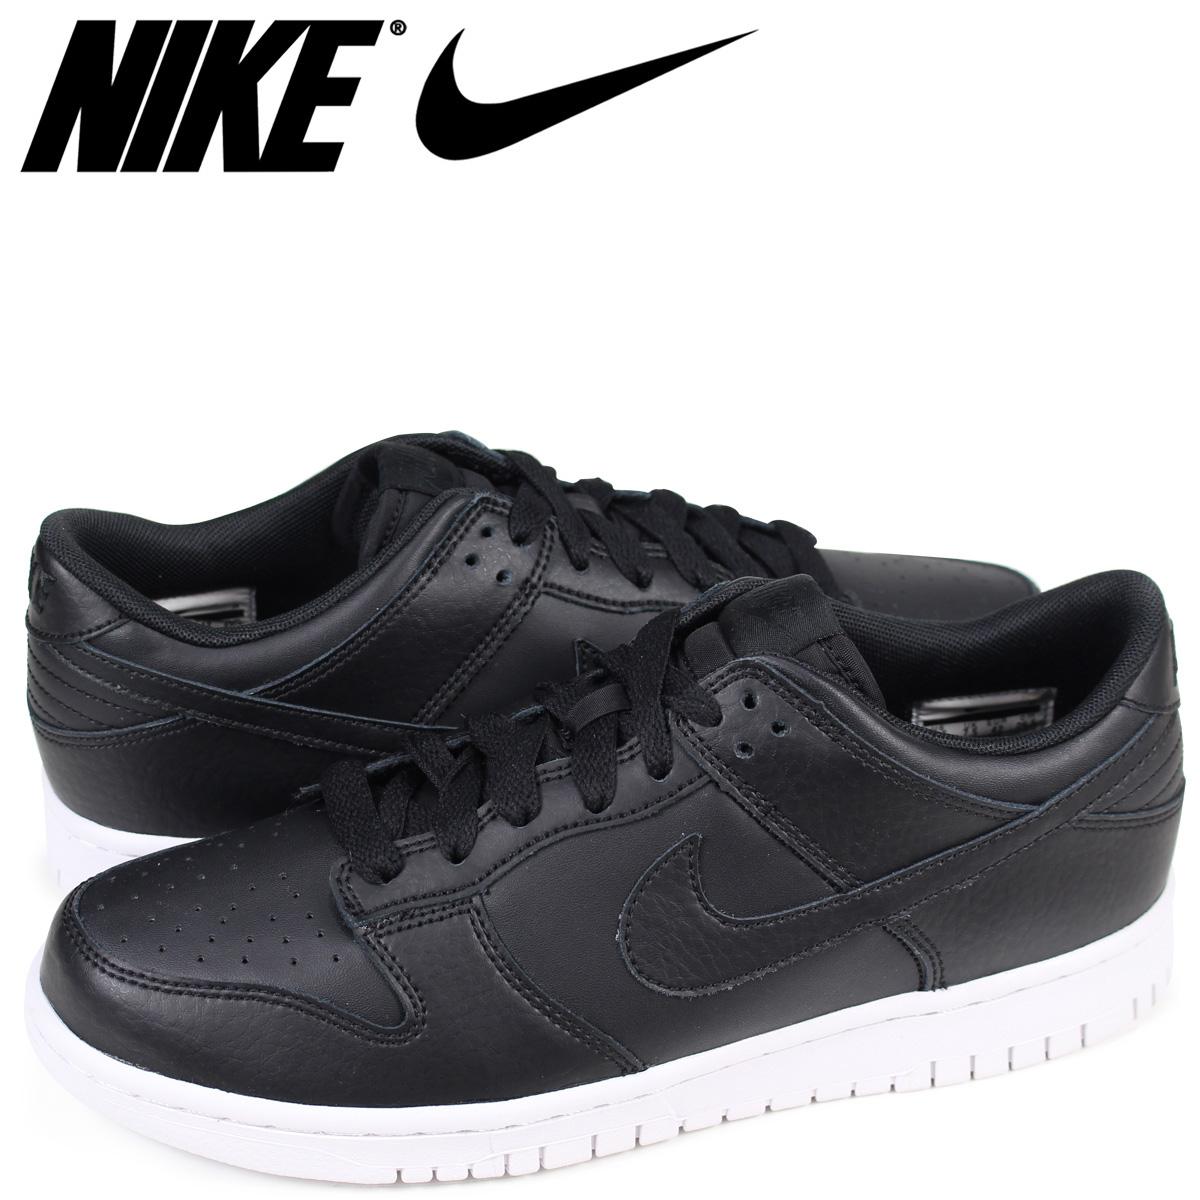 d10c47e14caf SneaK Online Shop  Nike NIKE dunk low sneakers DUNK LOW men 904